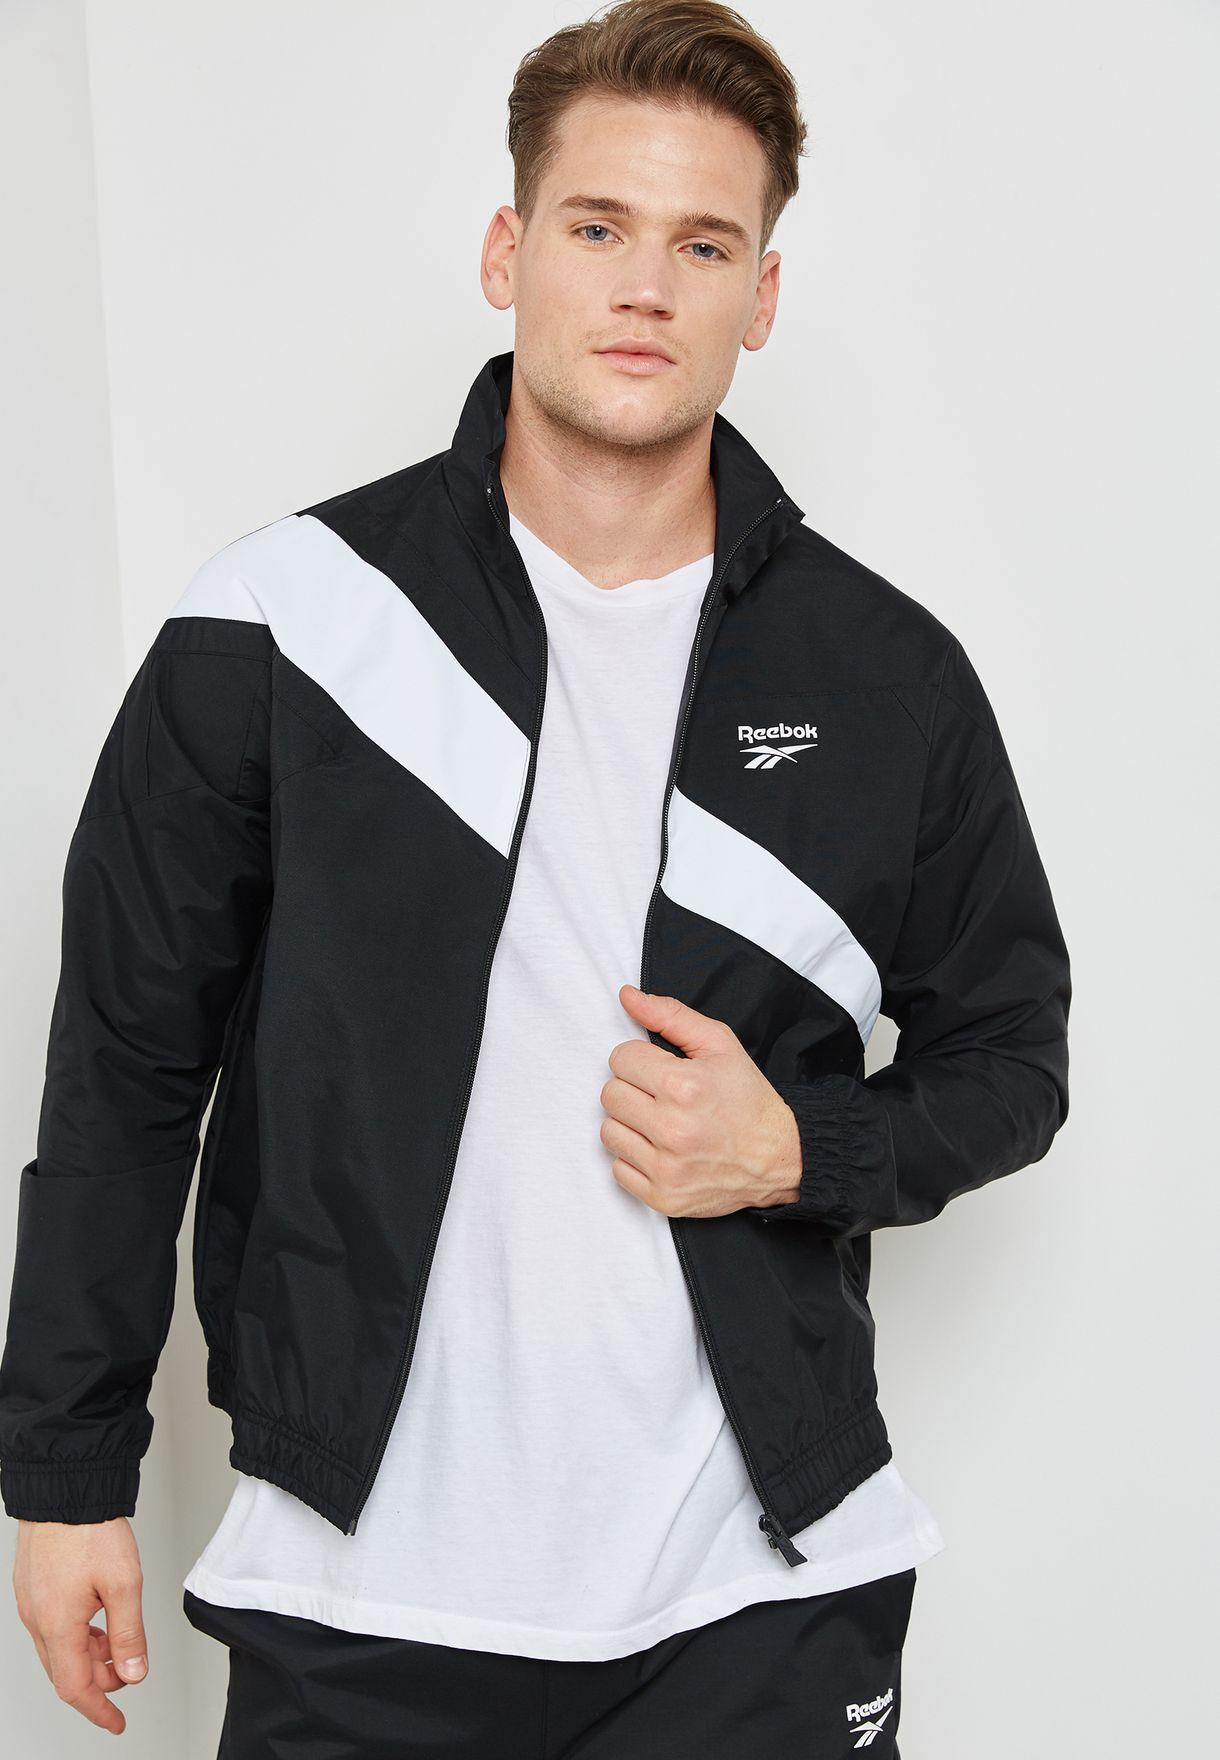 24152164132 Shop Reebok black LF Track Jacket CE4995 for Men in UAE - RE019AT44XWP